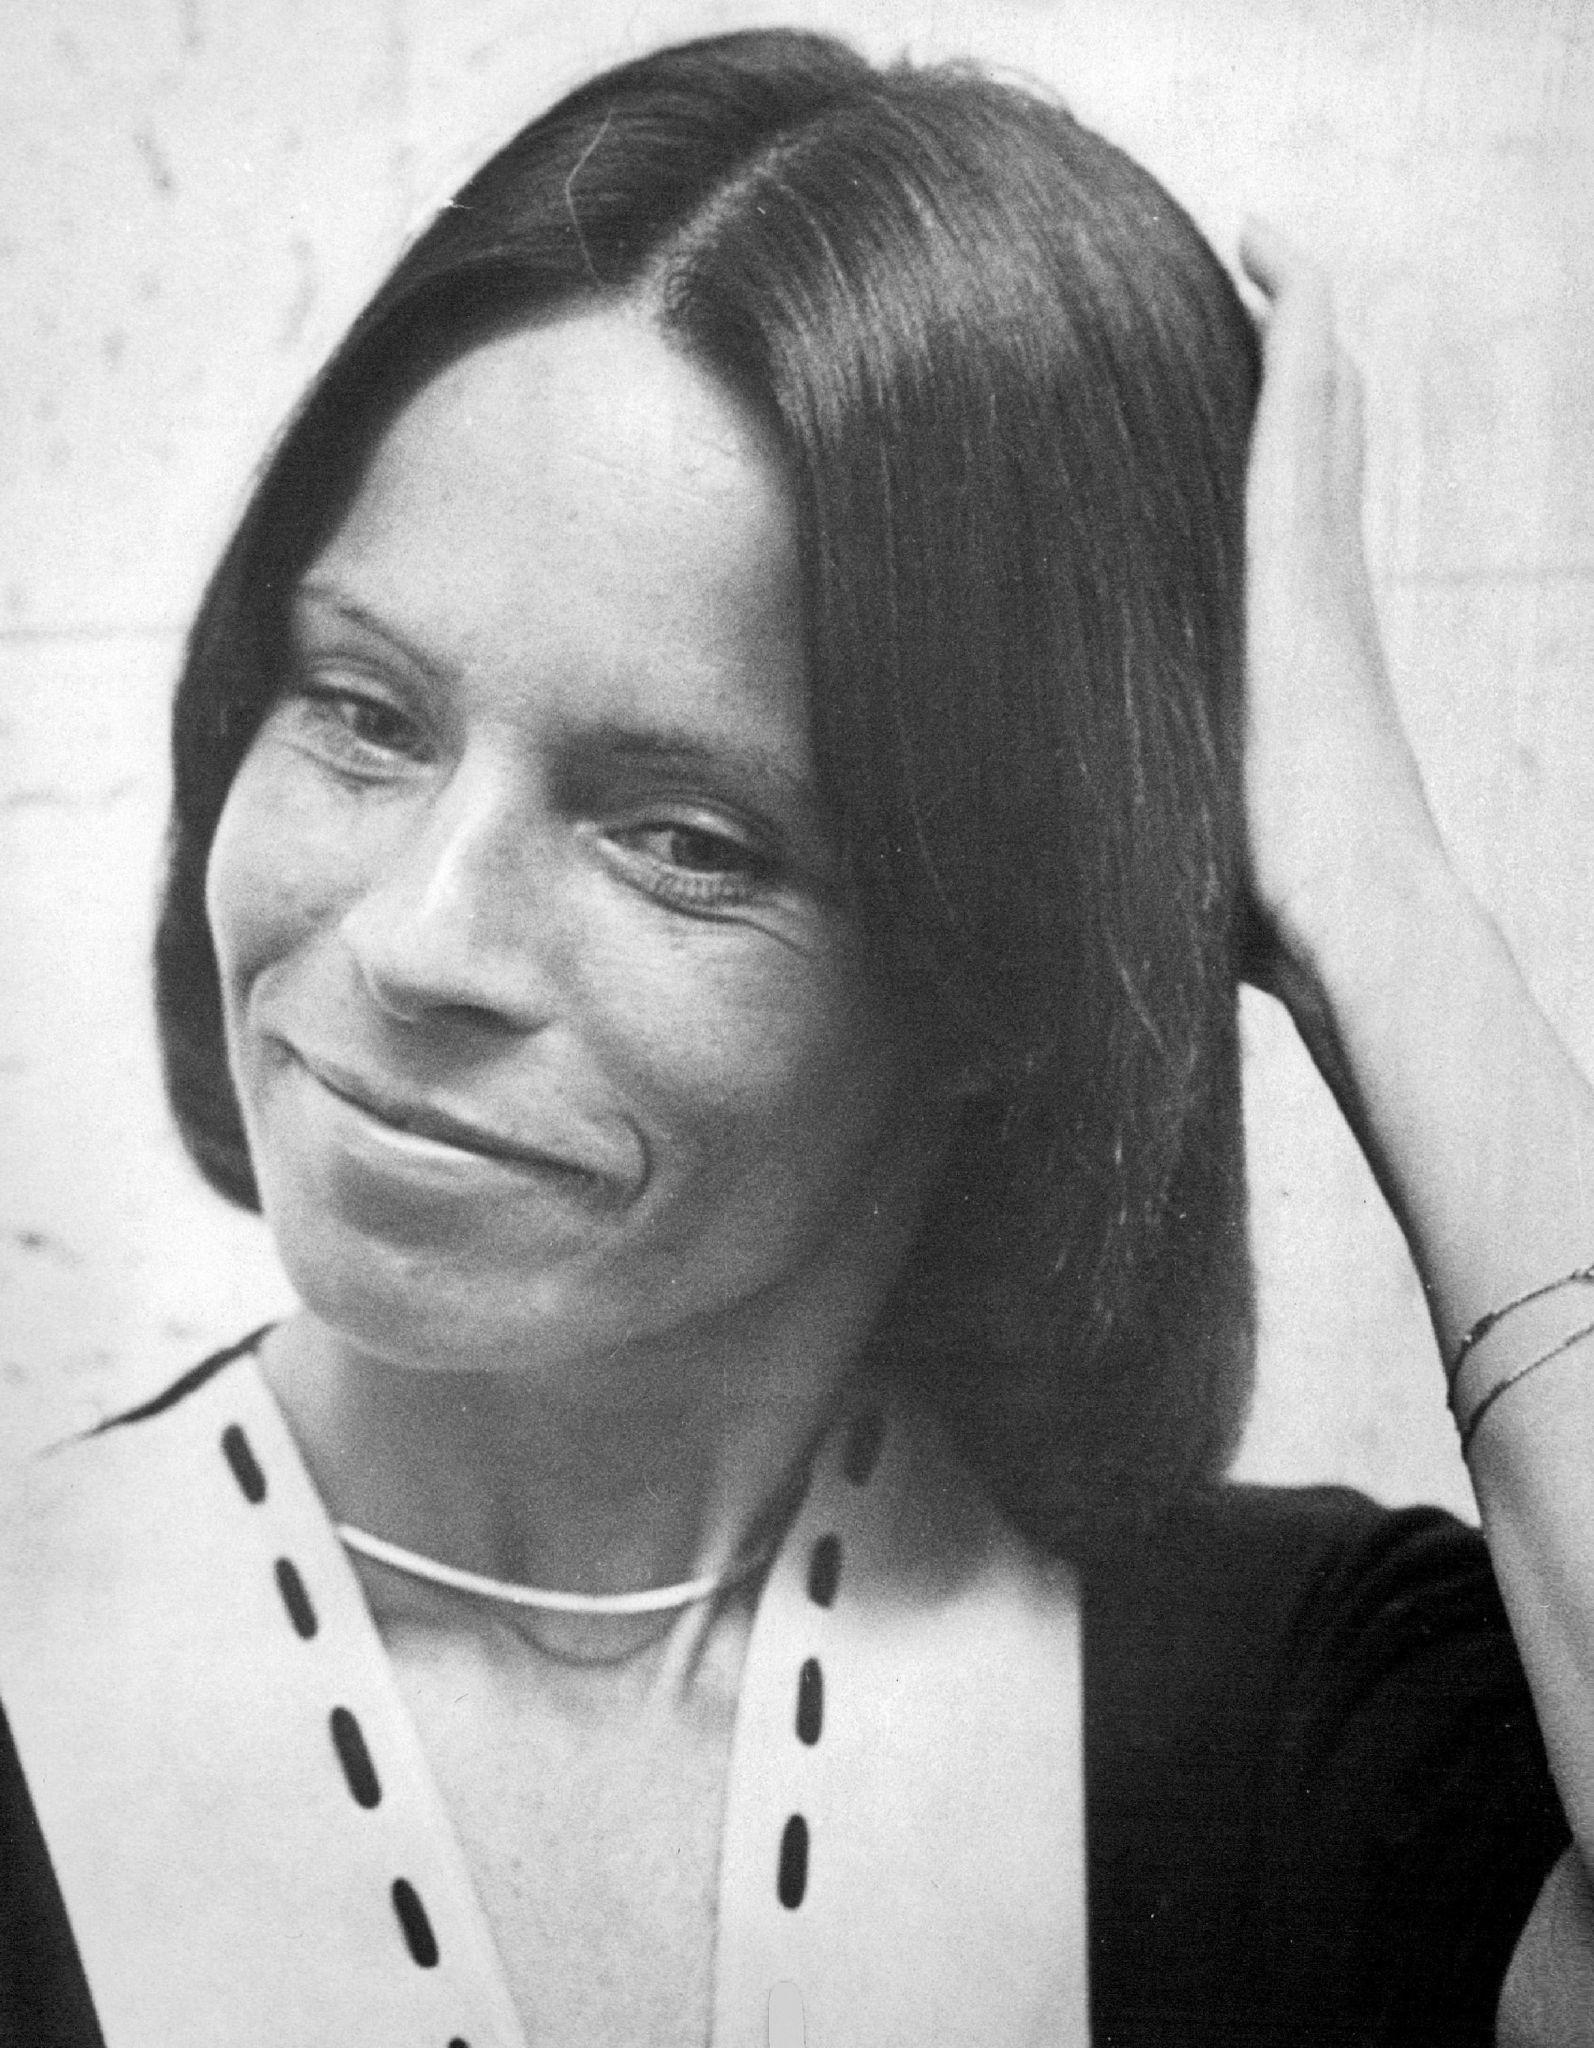 Chyler Leigh,Maggie Smith (born 1934) Erotic fotos Lourdes Robles,Aurora Mardiganian